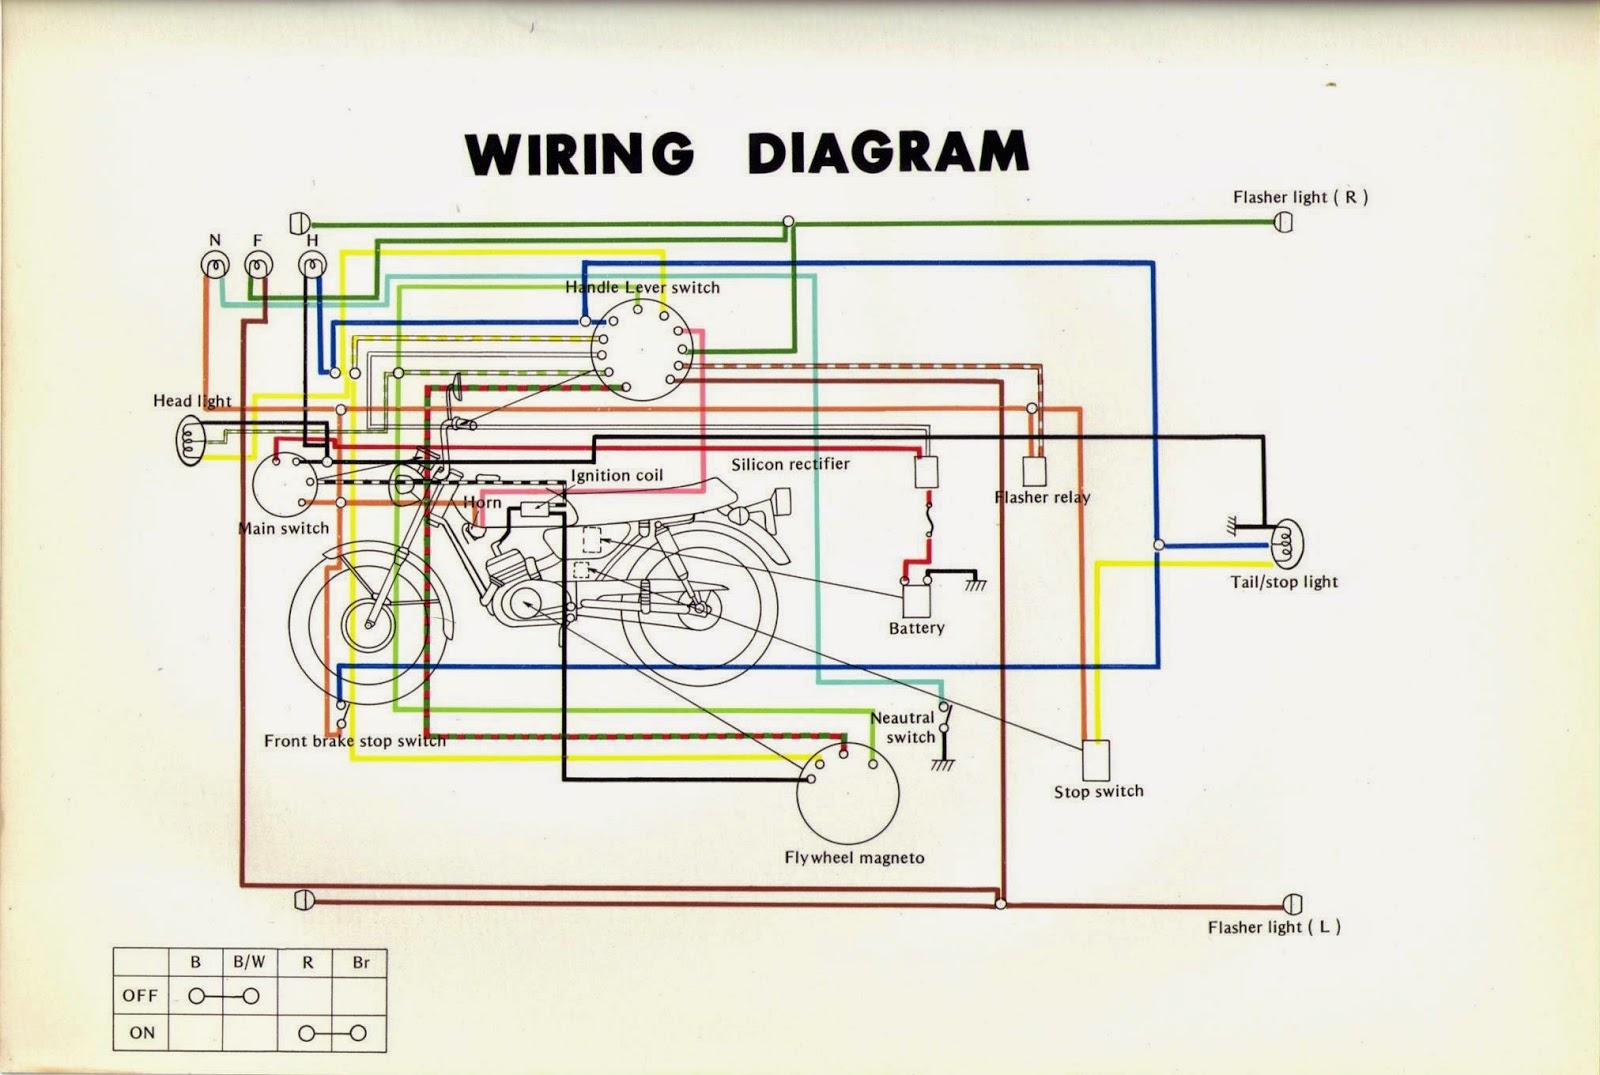 hd wallpapers wiring diagram yamaha vega zr desktop53mobile cf rh desktop53mobile cf Hunter Fan Switch Wiring Diagram wiring diagram kelistrikan vega zr